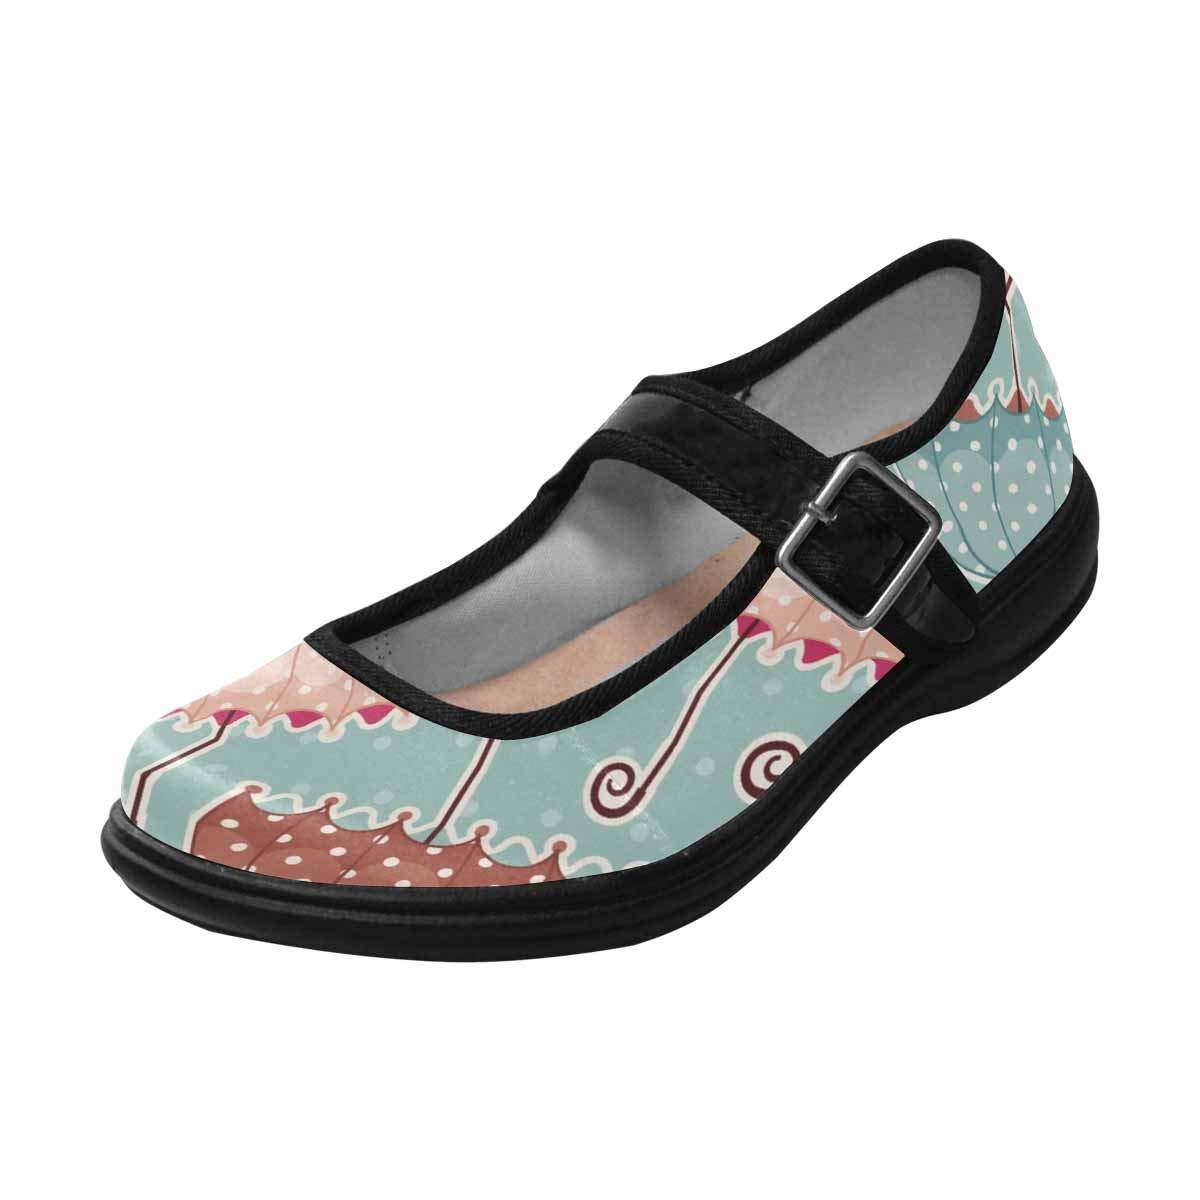 Scholls Umbrellas INTERESTPRINT Womens Slip-Resistant Mary Jane Flats for Dr